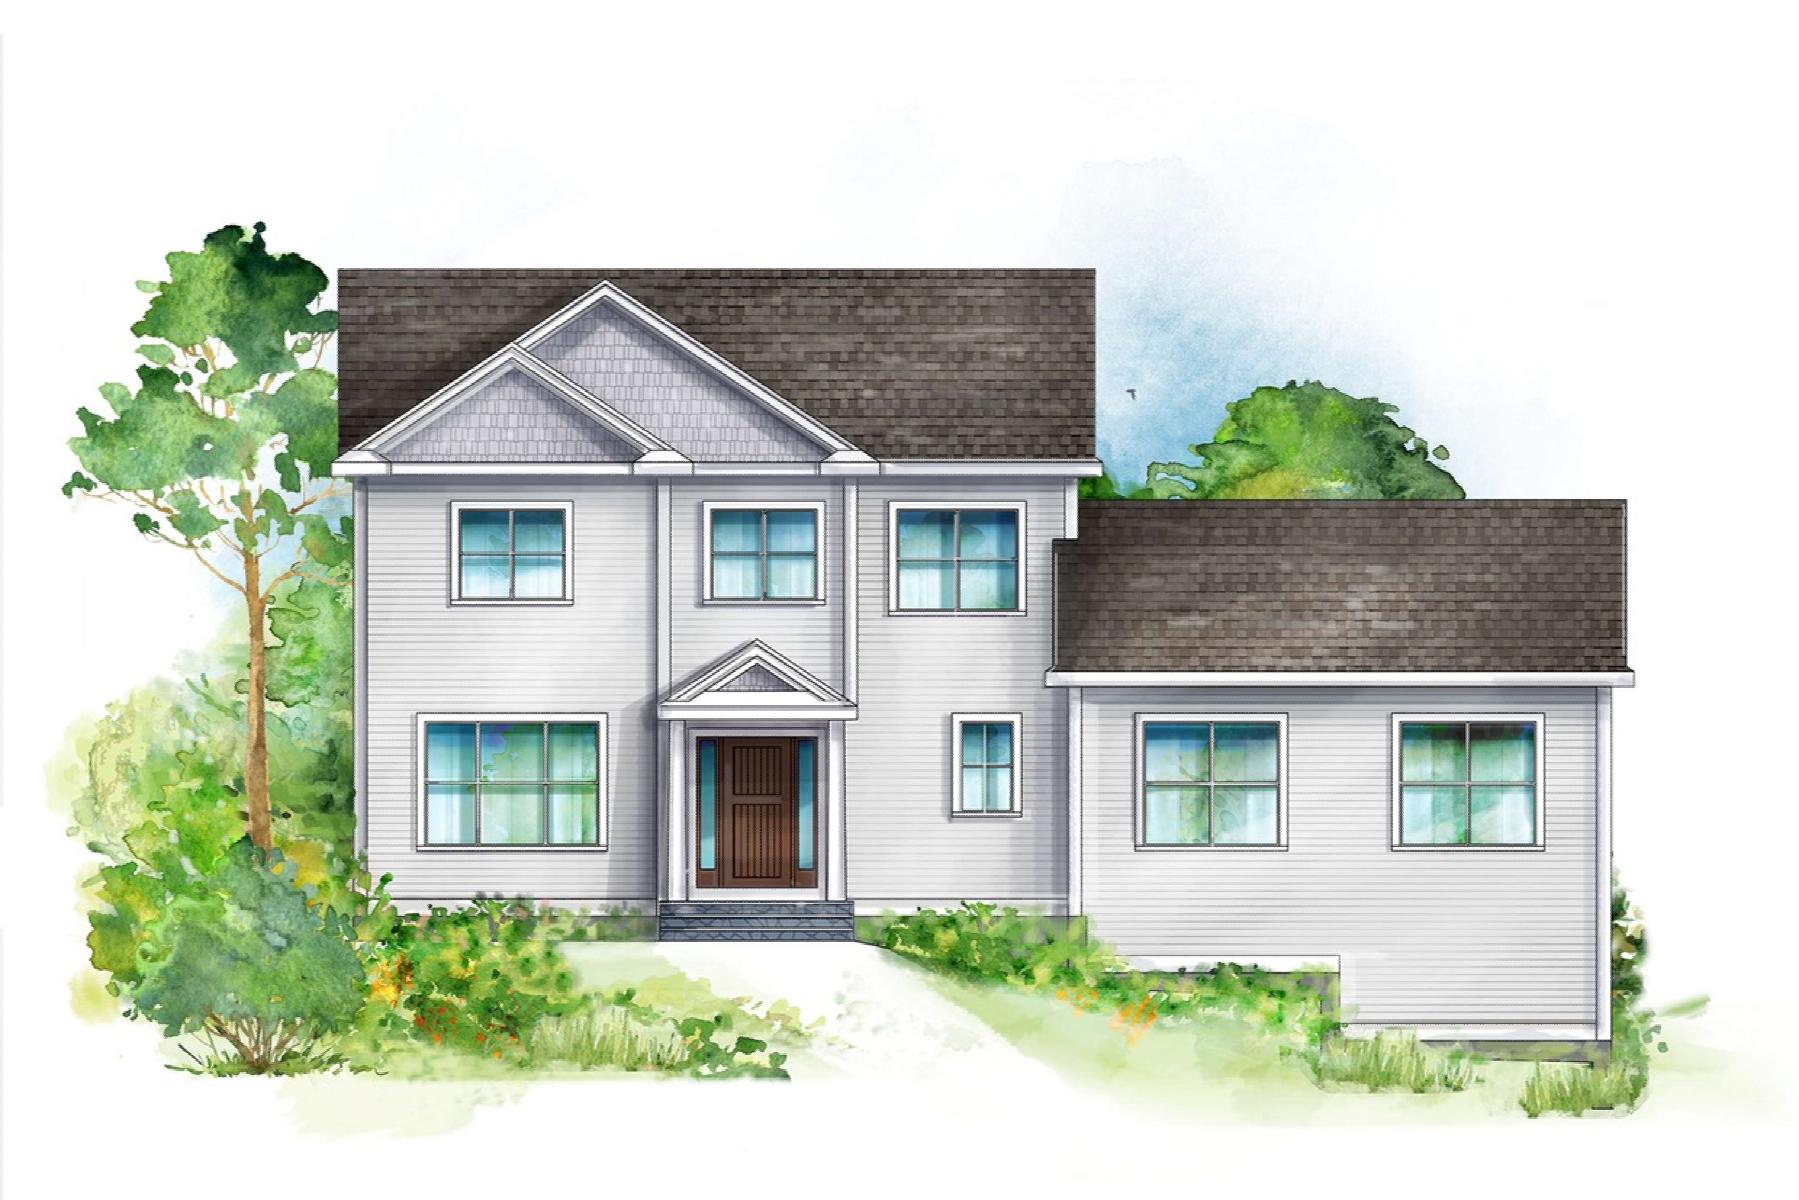 獨棟家庭住宅 為 出售 在 15 Hume Road, Bedford 15 Hume Rd Bedford, 麻塞諸塞州 01730 美國